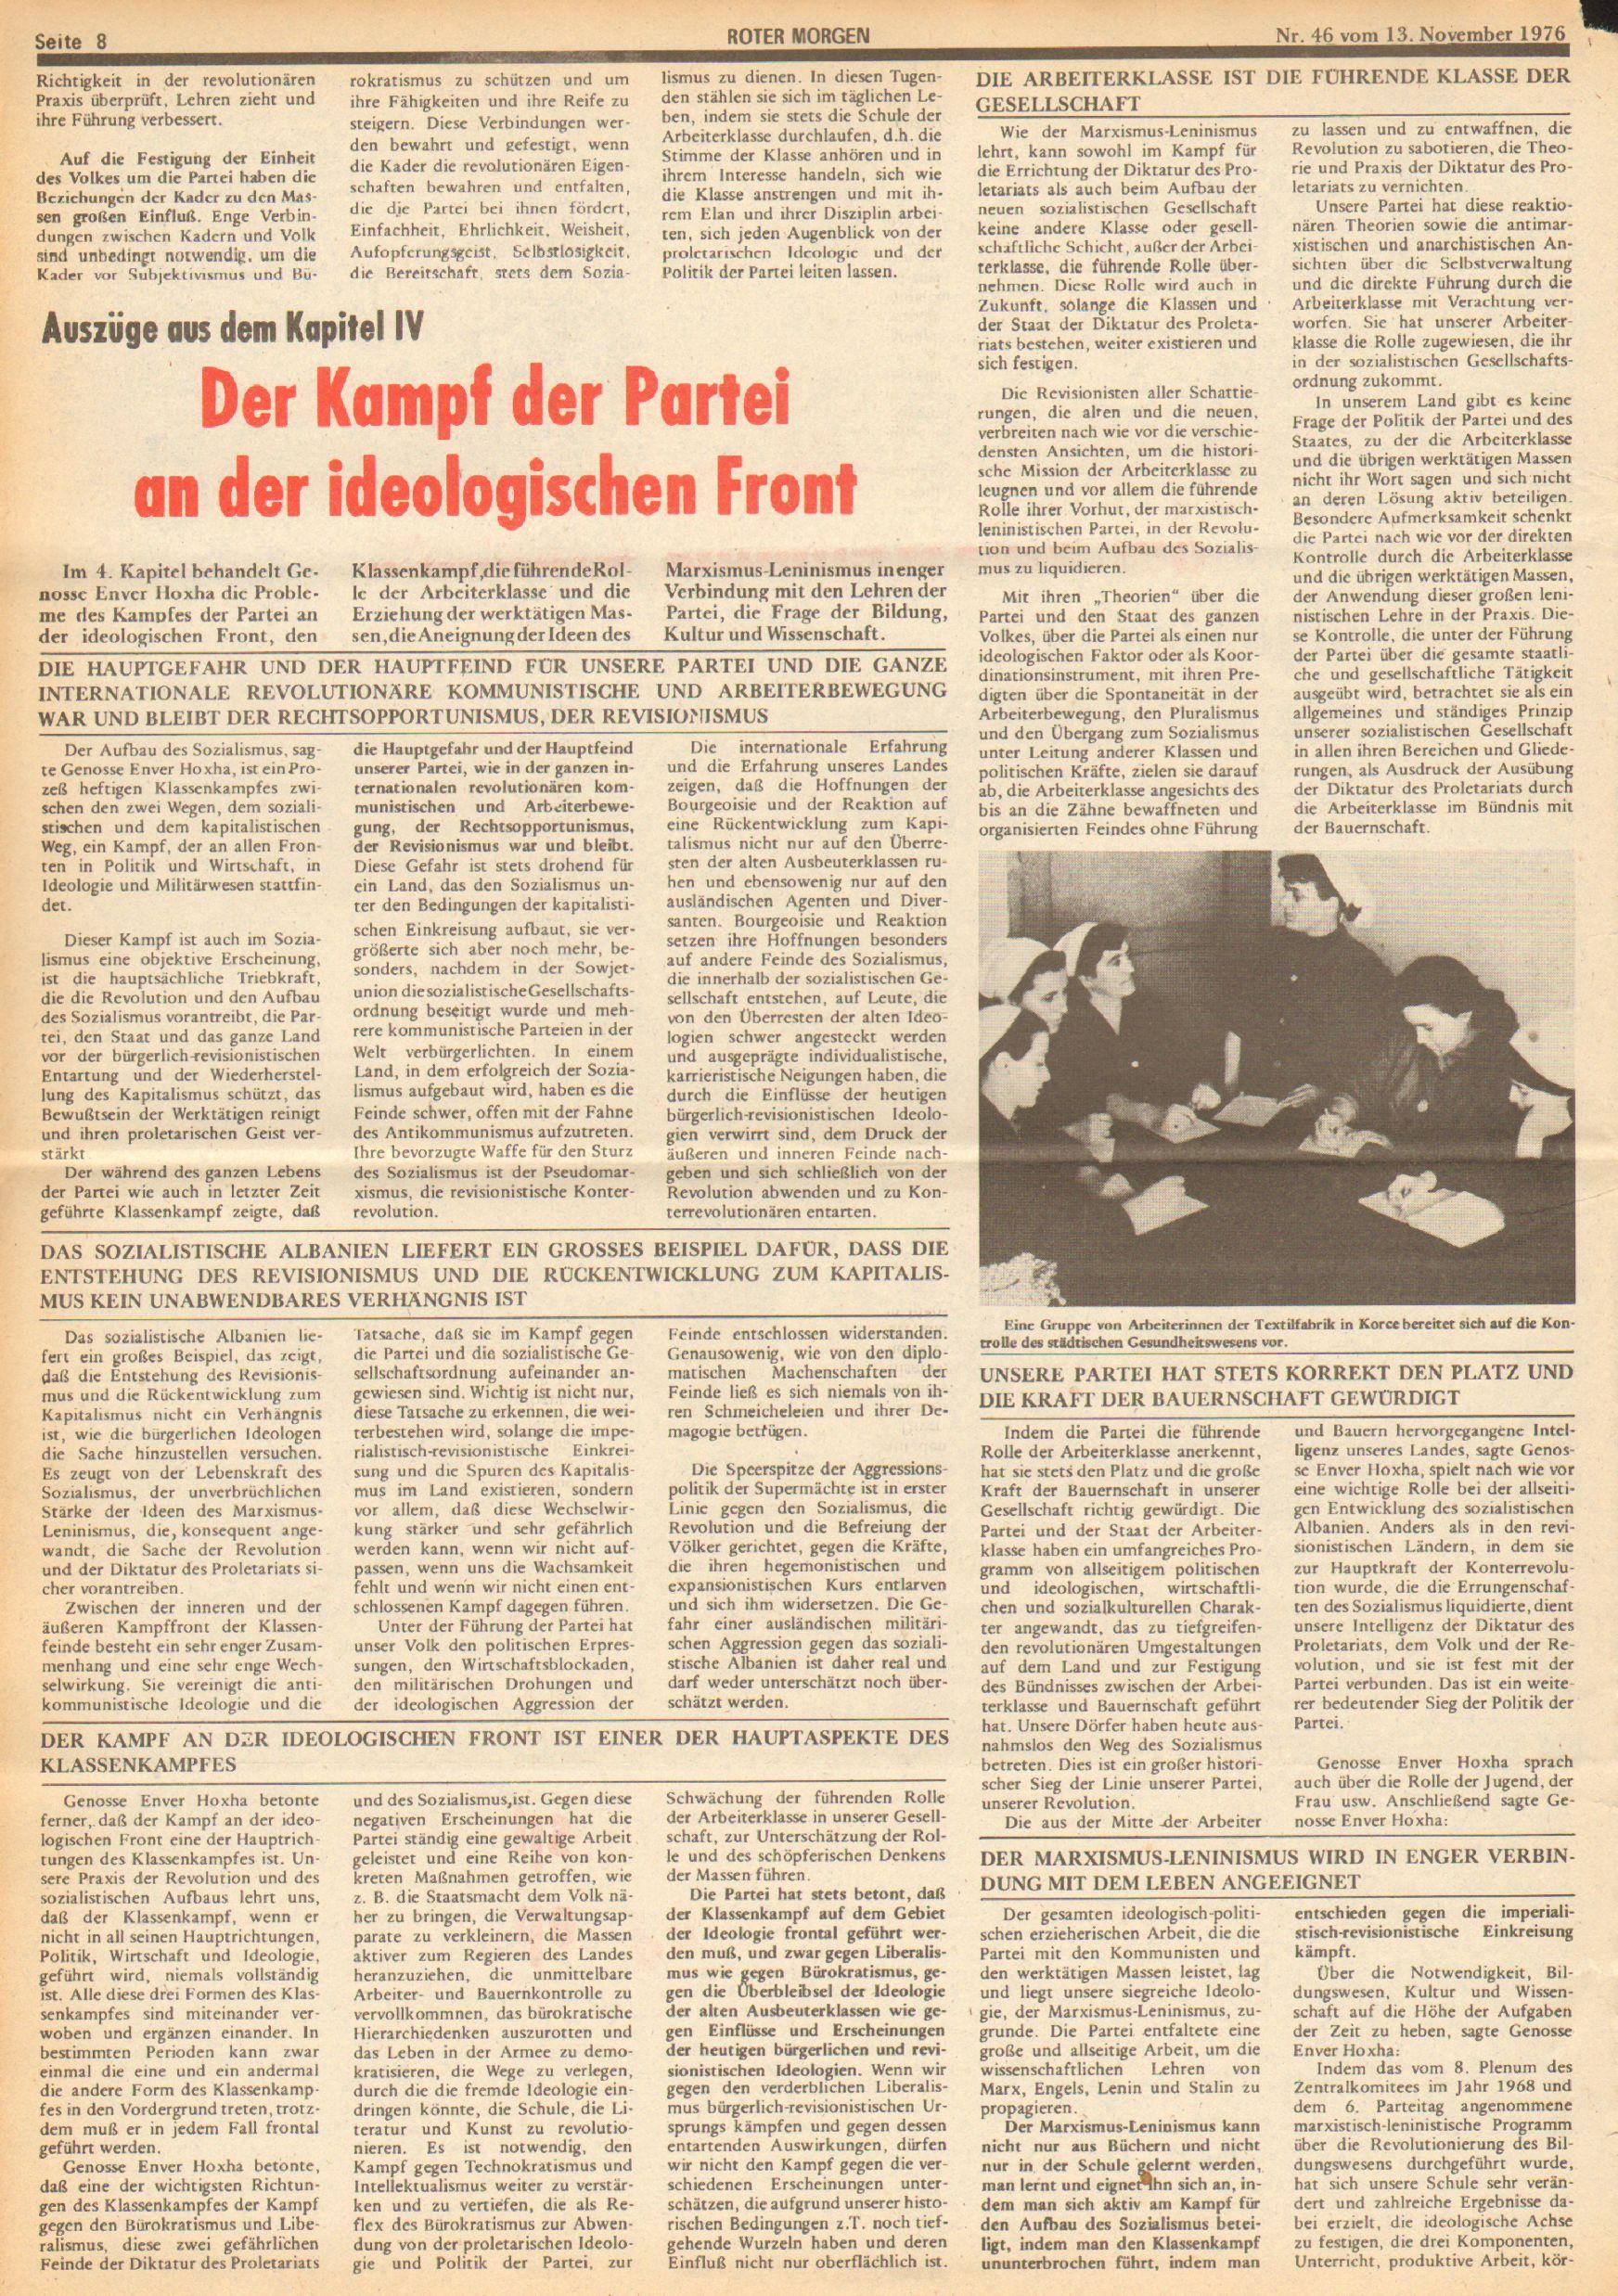 Roter Morgen, 10. Jg., 13. November 1976, Nr. 46, Seite 8